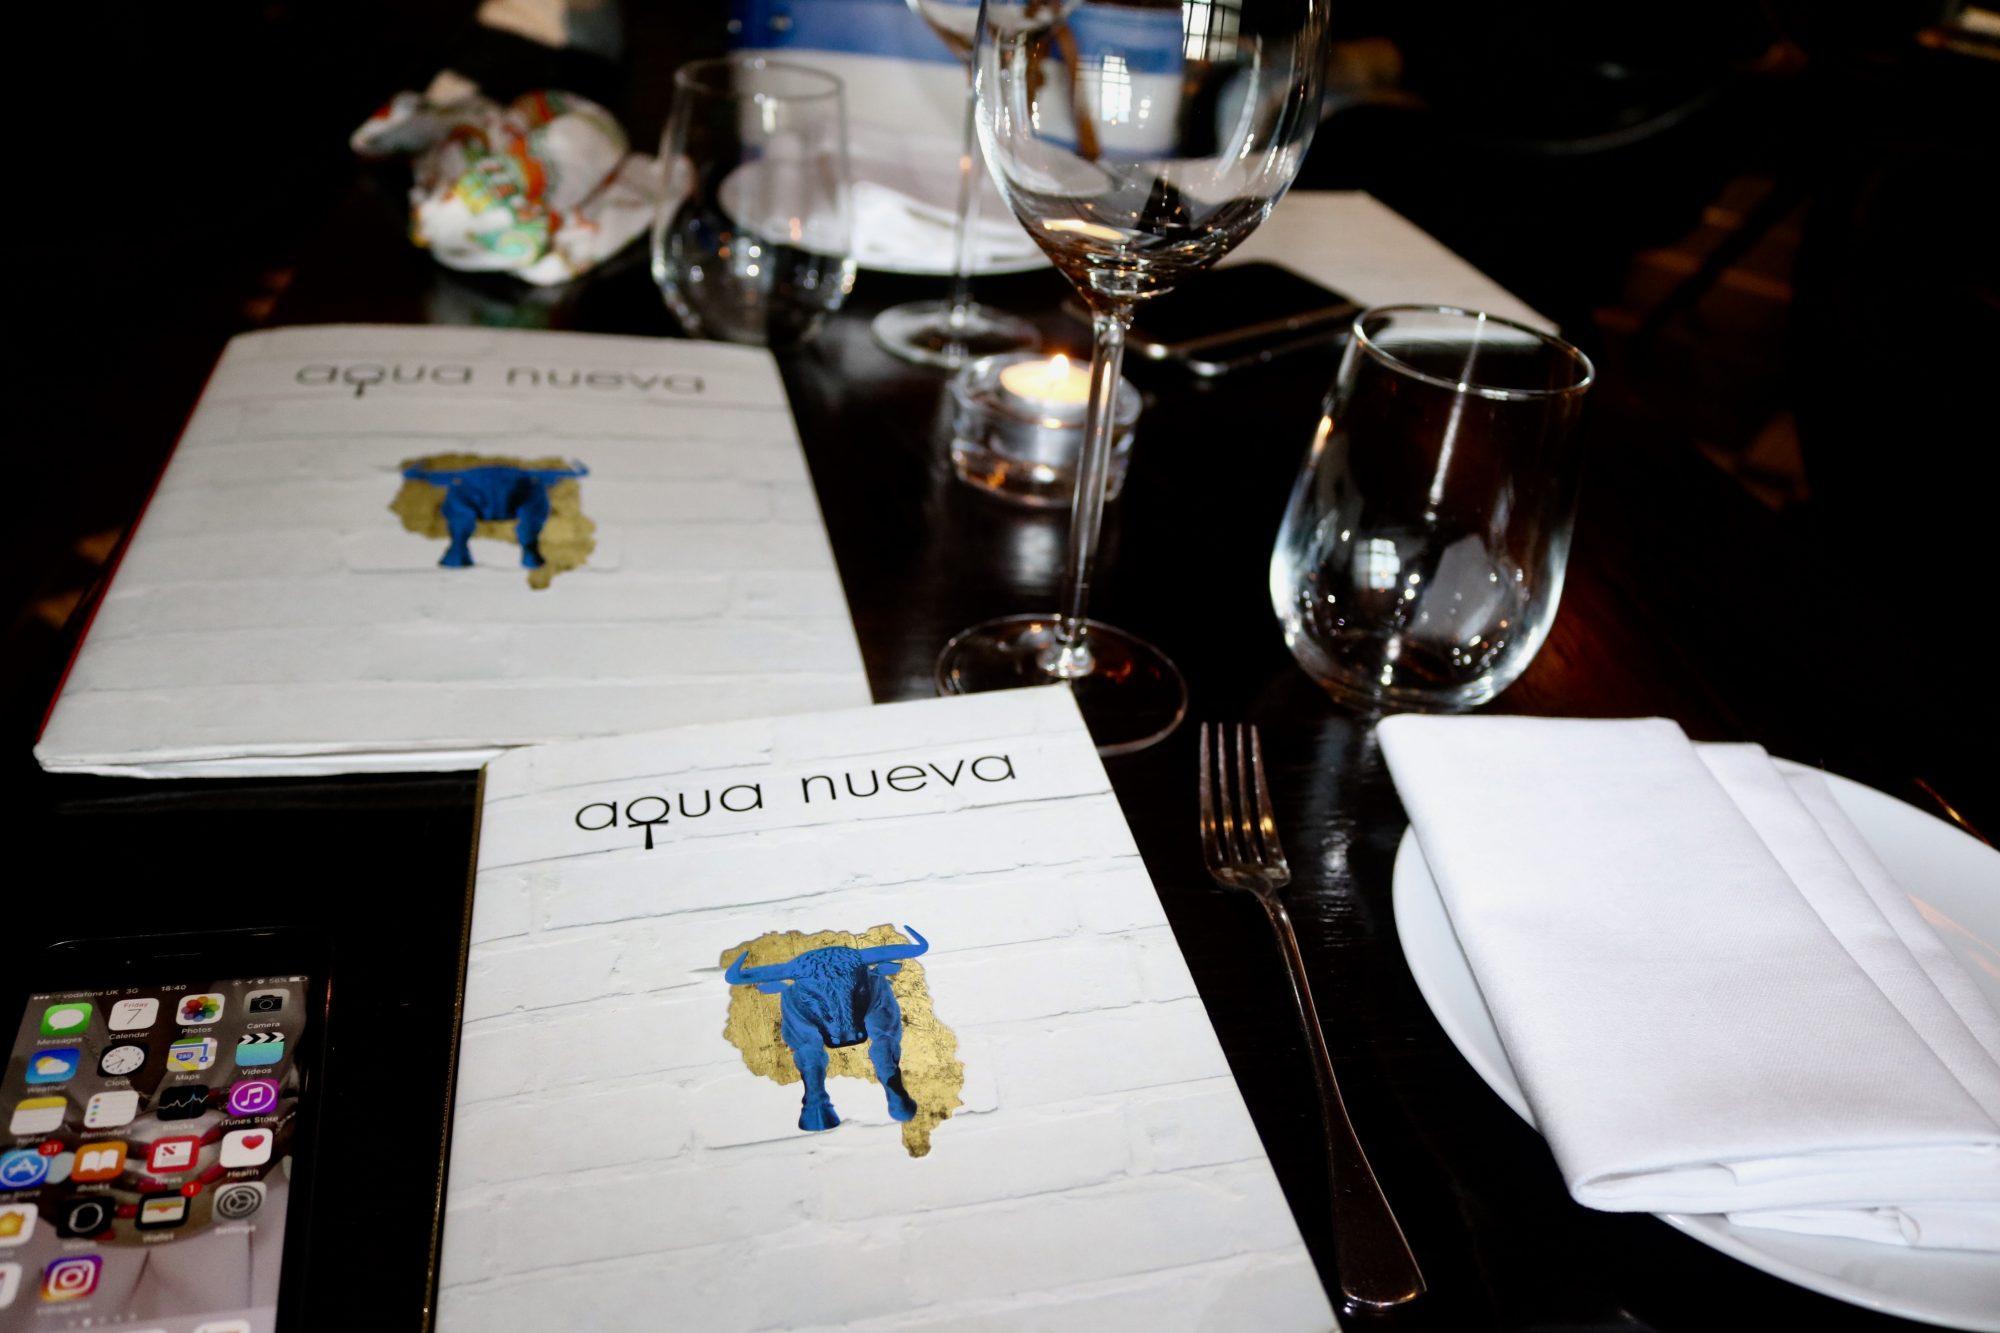 Cynthia Tabe Aqua Nueva London Restaurants